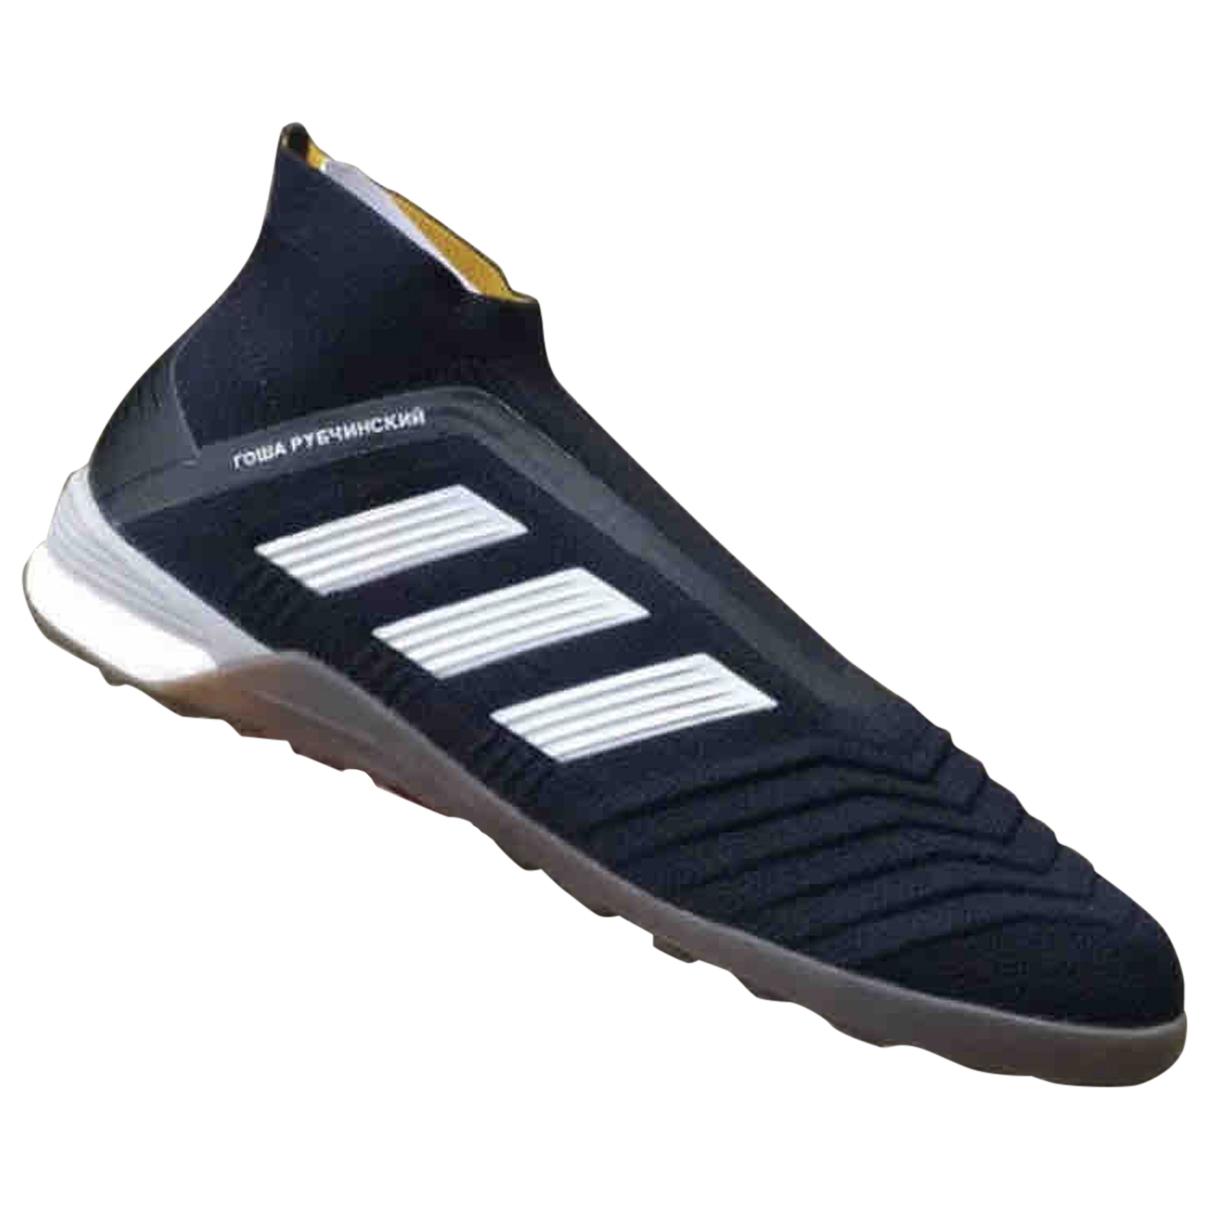 Adidas X Gosha Rubchinskiy N Black Cloth Trainers for Men 10.5 UK